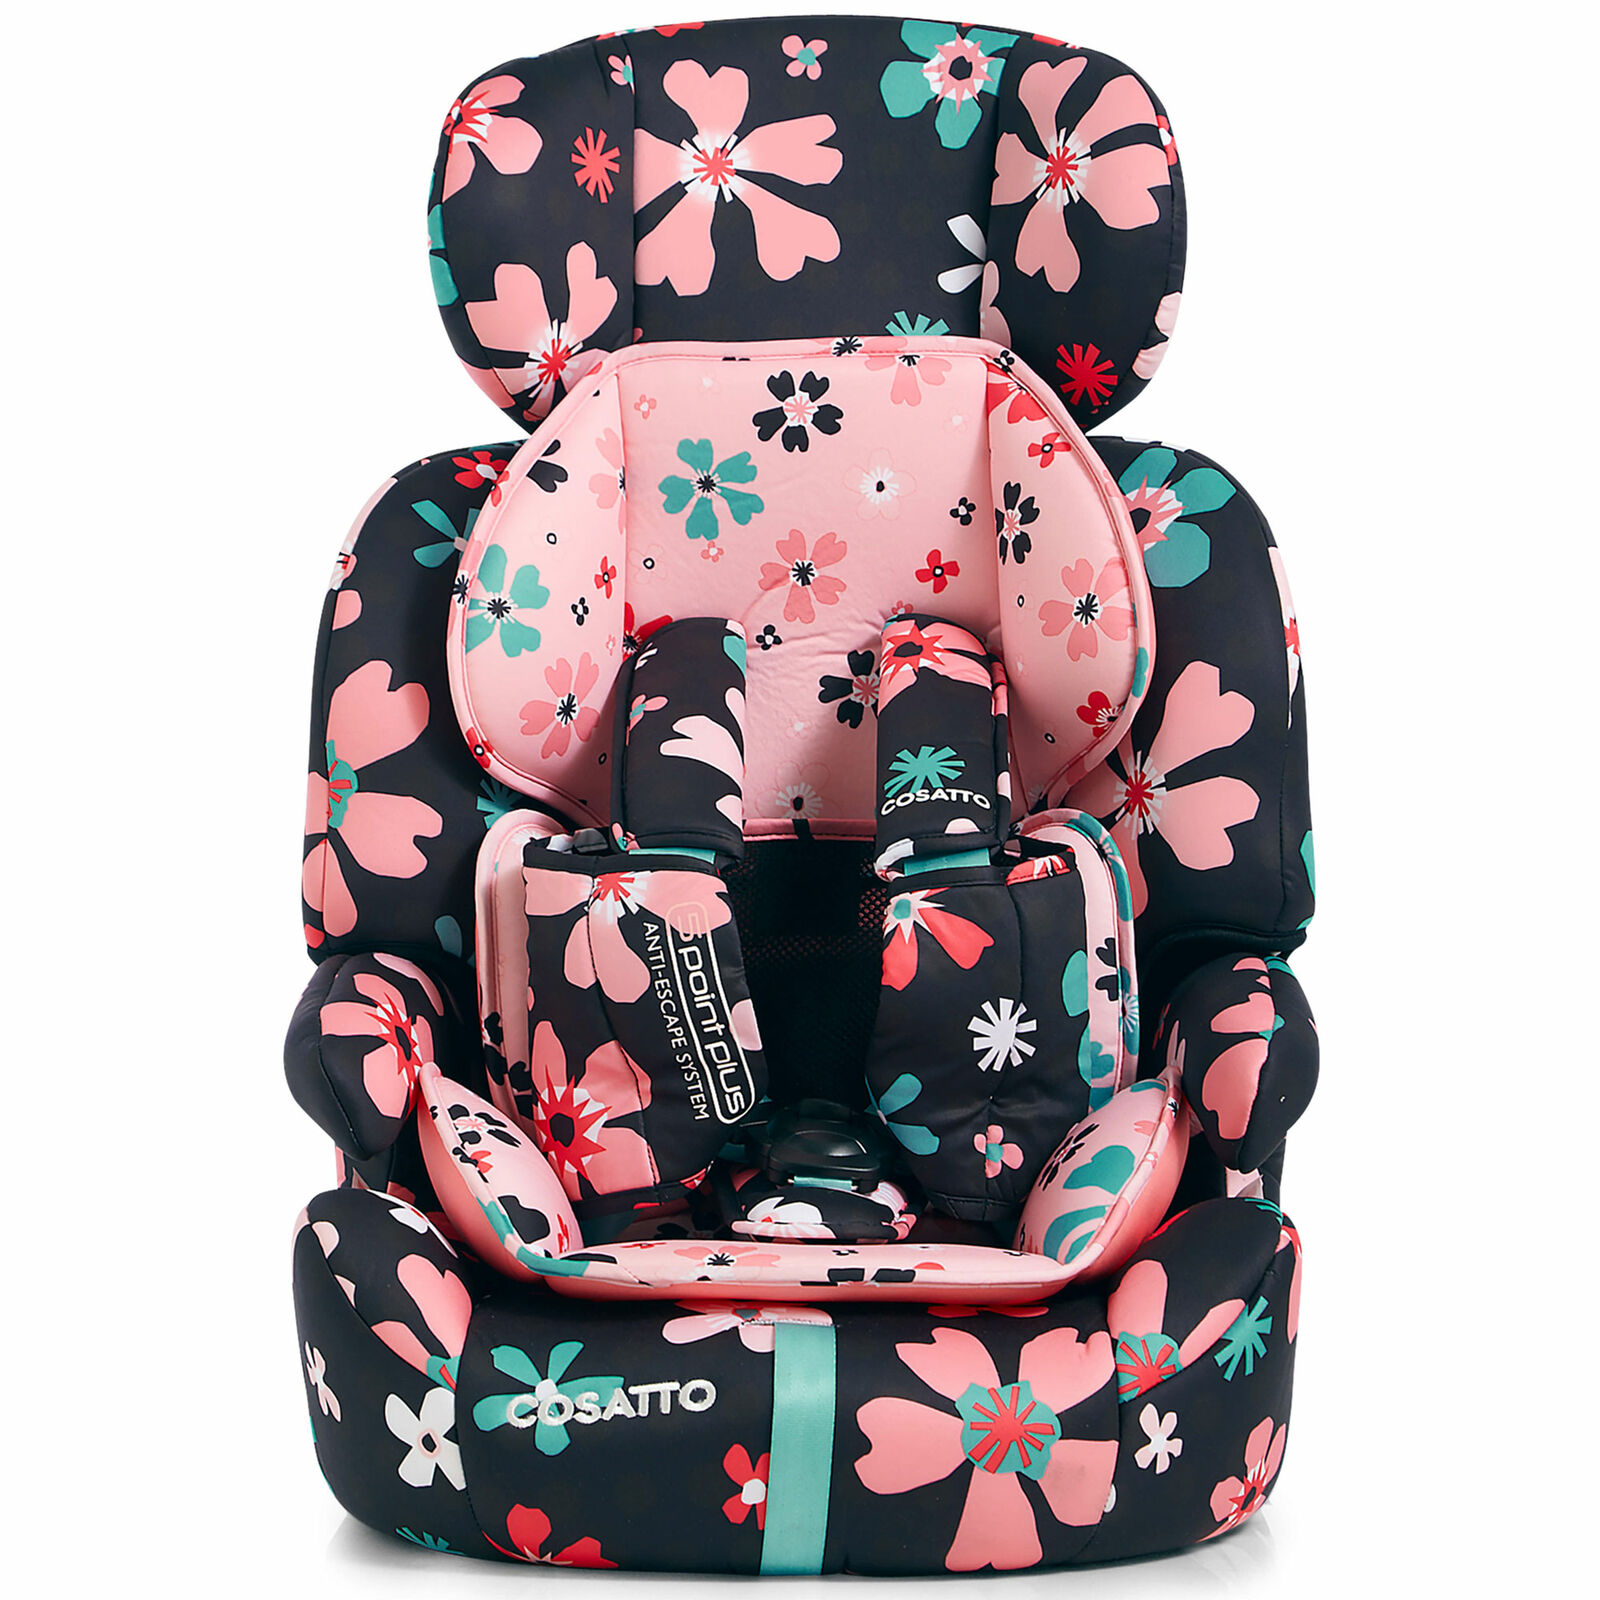 PAPER PETALS Baby Travel BN Cosatto ZOOMI GROUP 123 ANTI-ESCAPE CAR SEAT